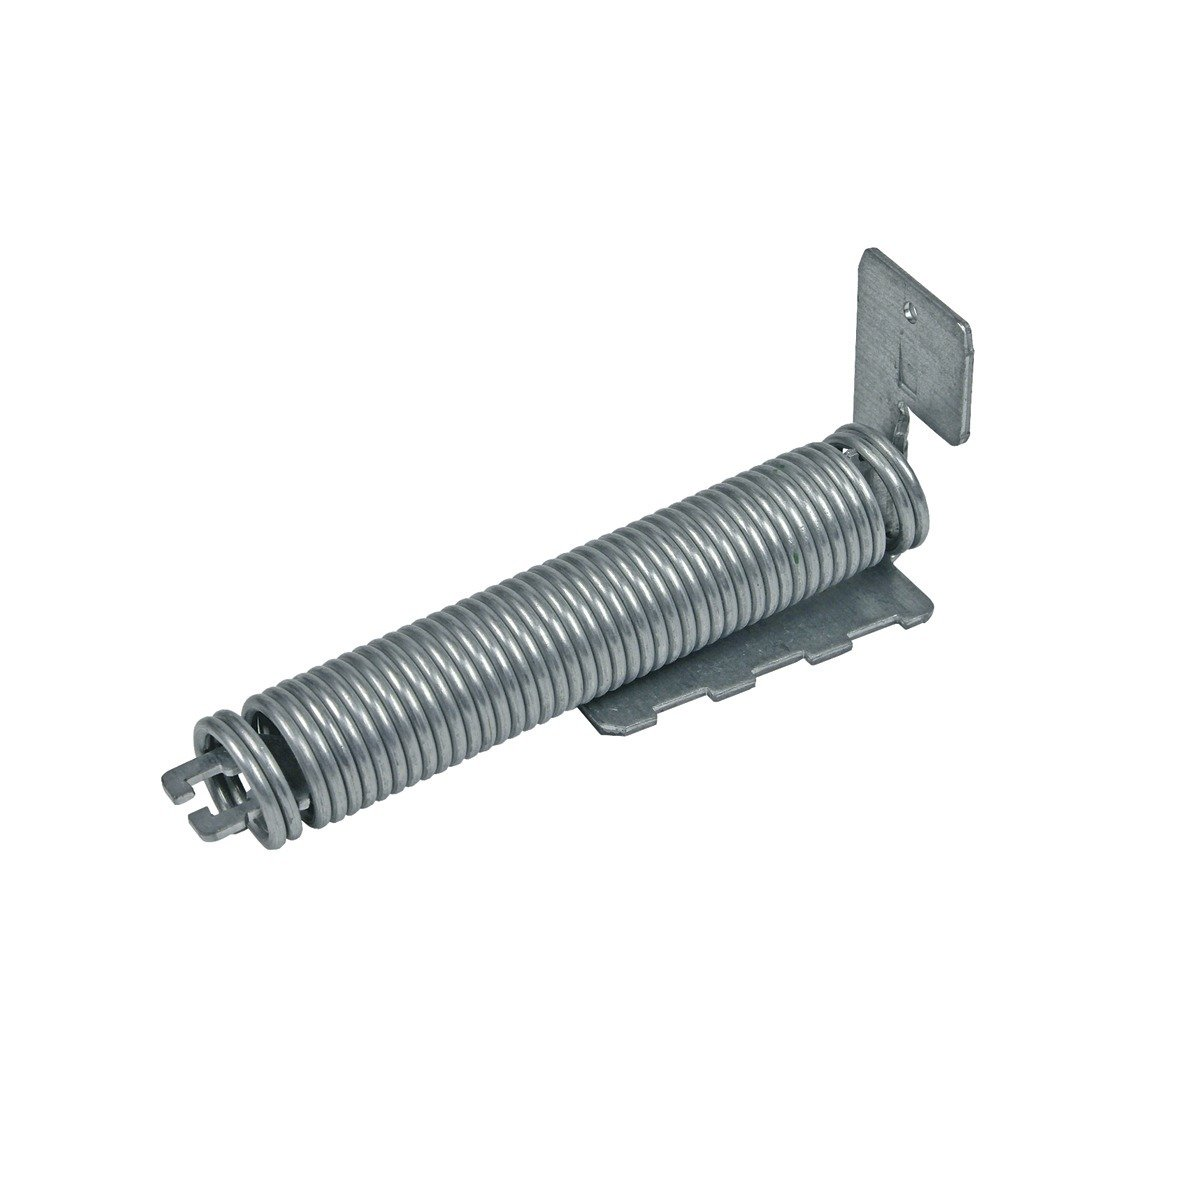 Türscharnierfeder Spülmaschine Original Bosch 00165736 Balay Constructa Gaggenau